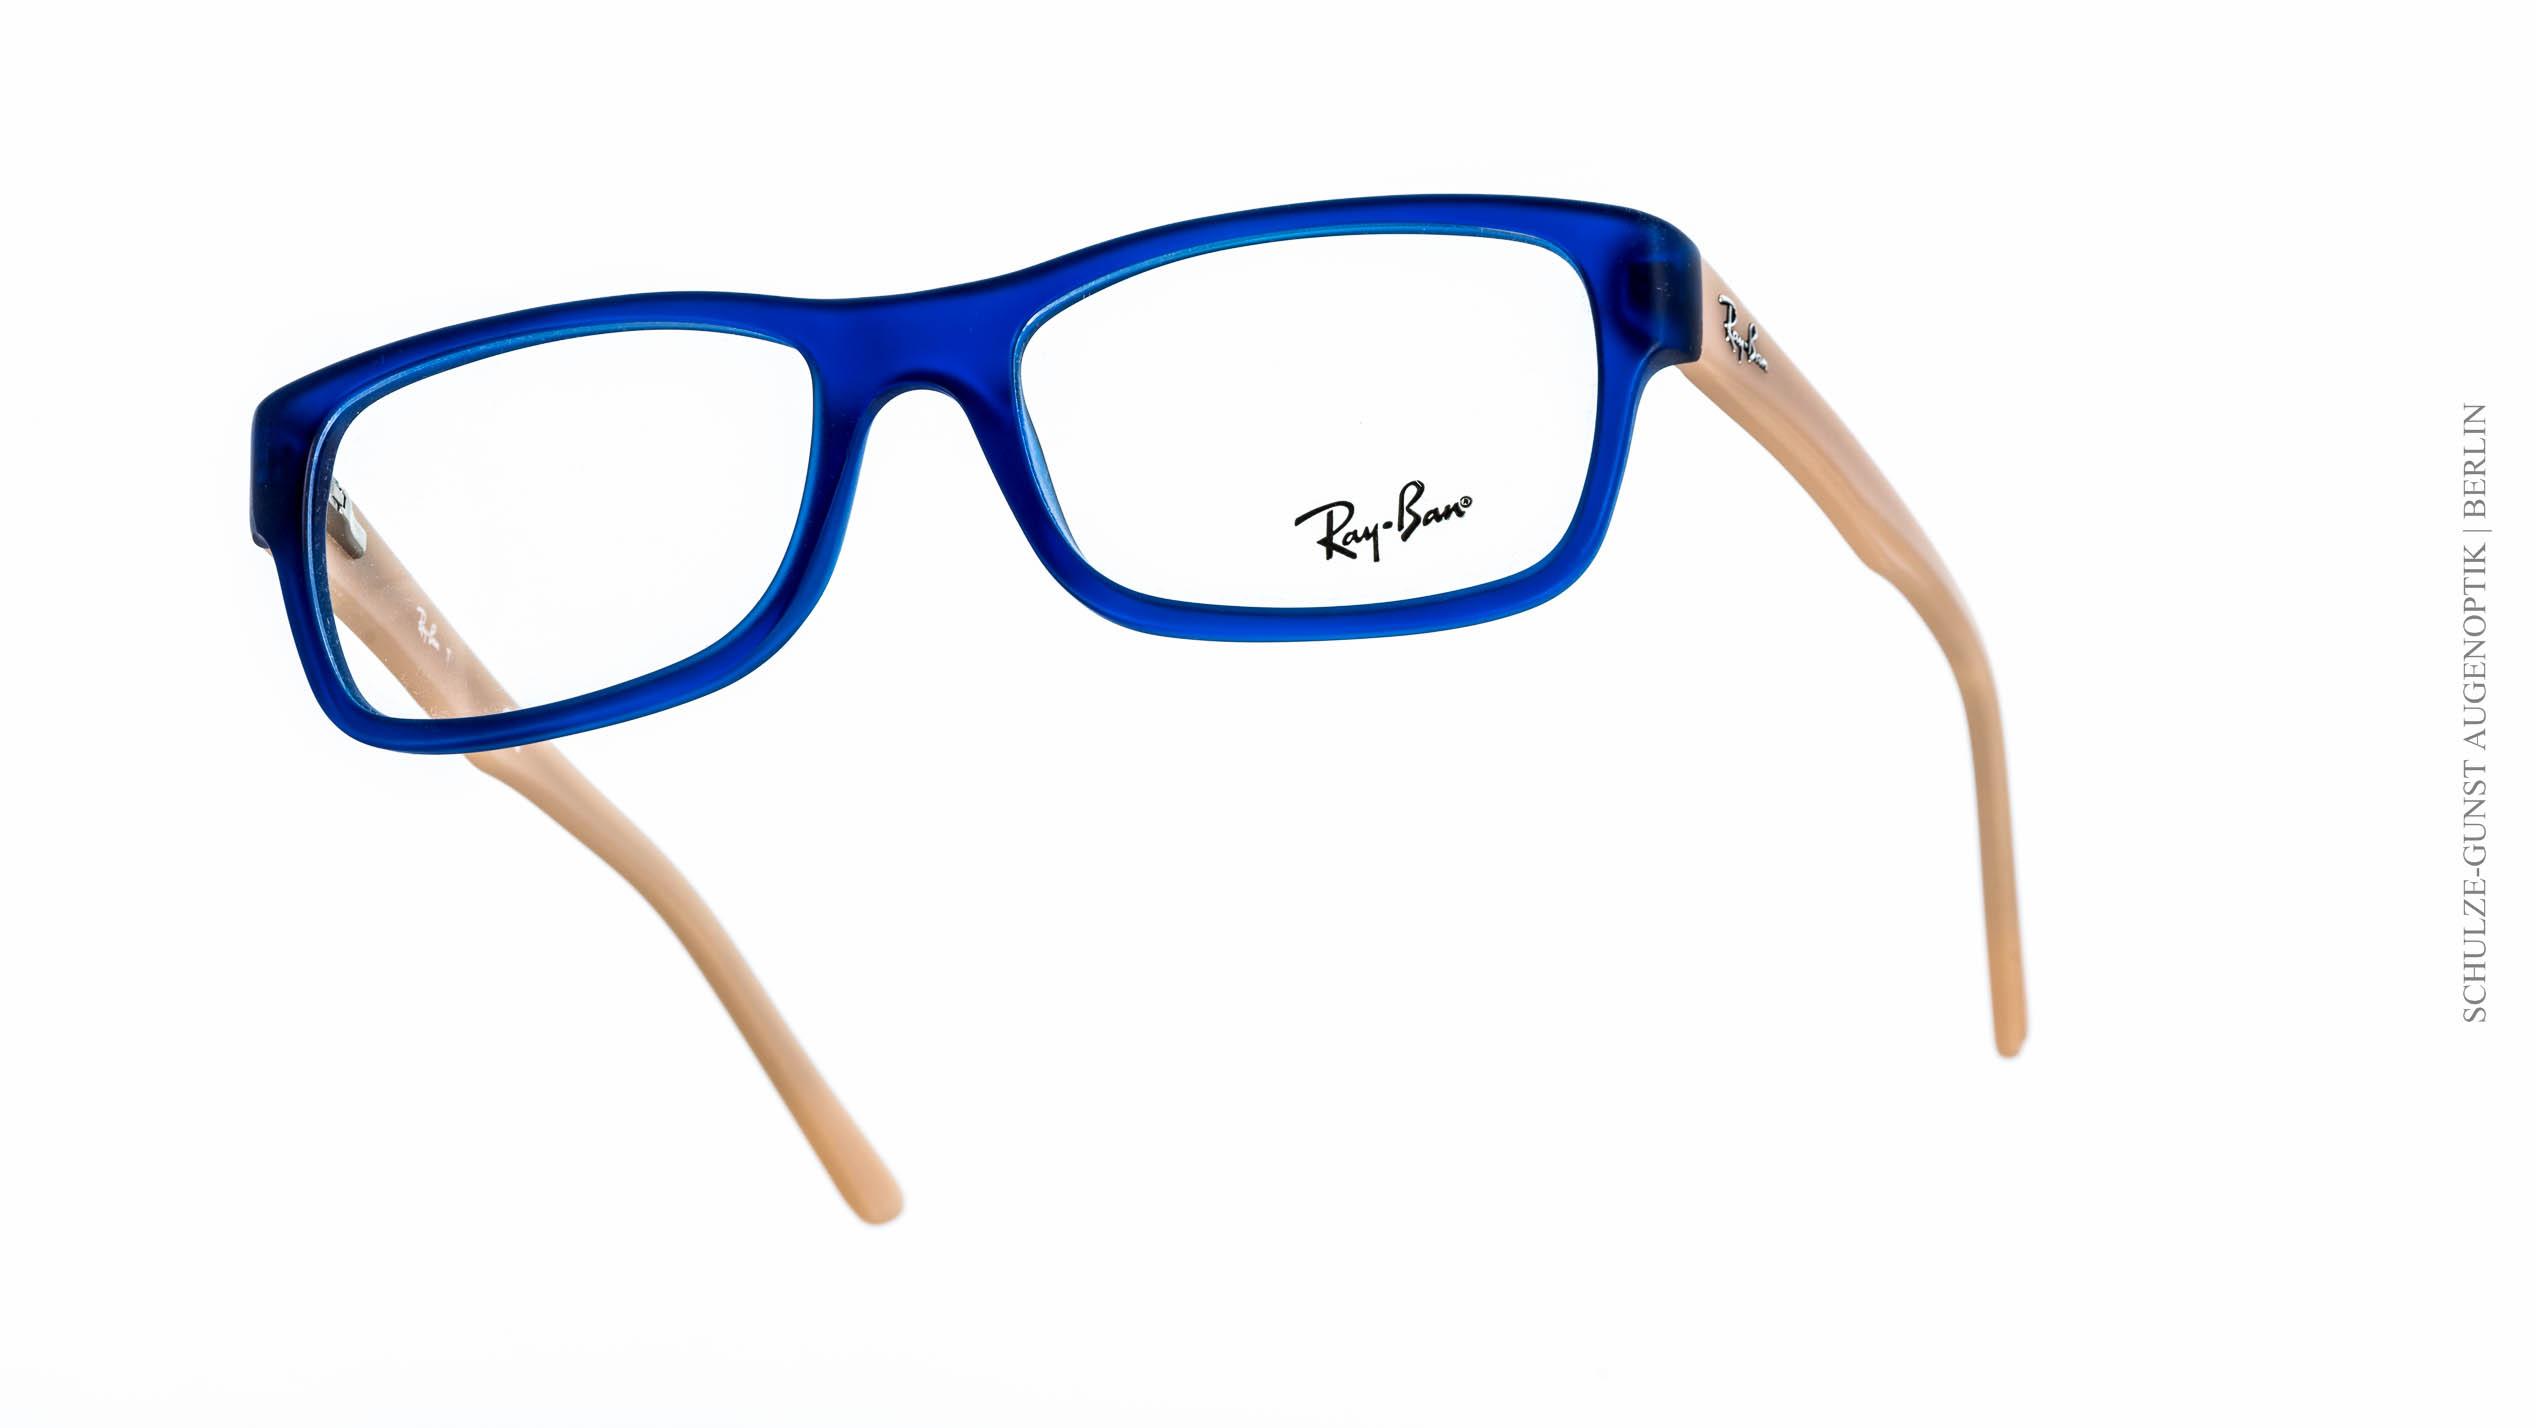 ray ban brille blaue bügel